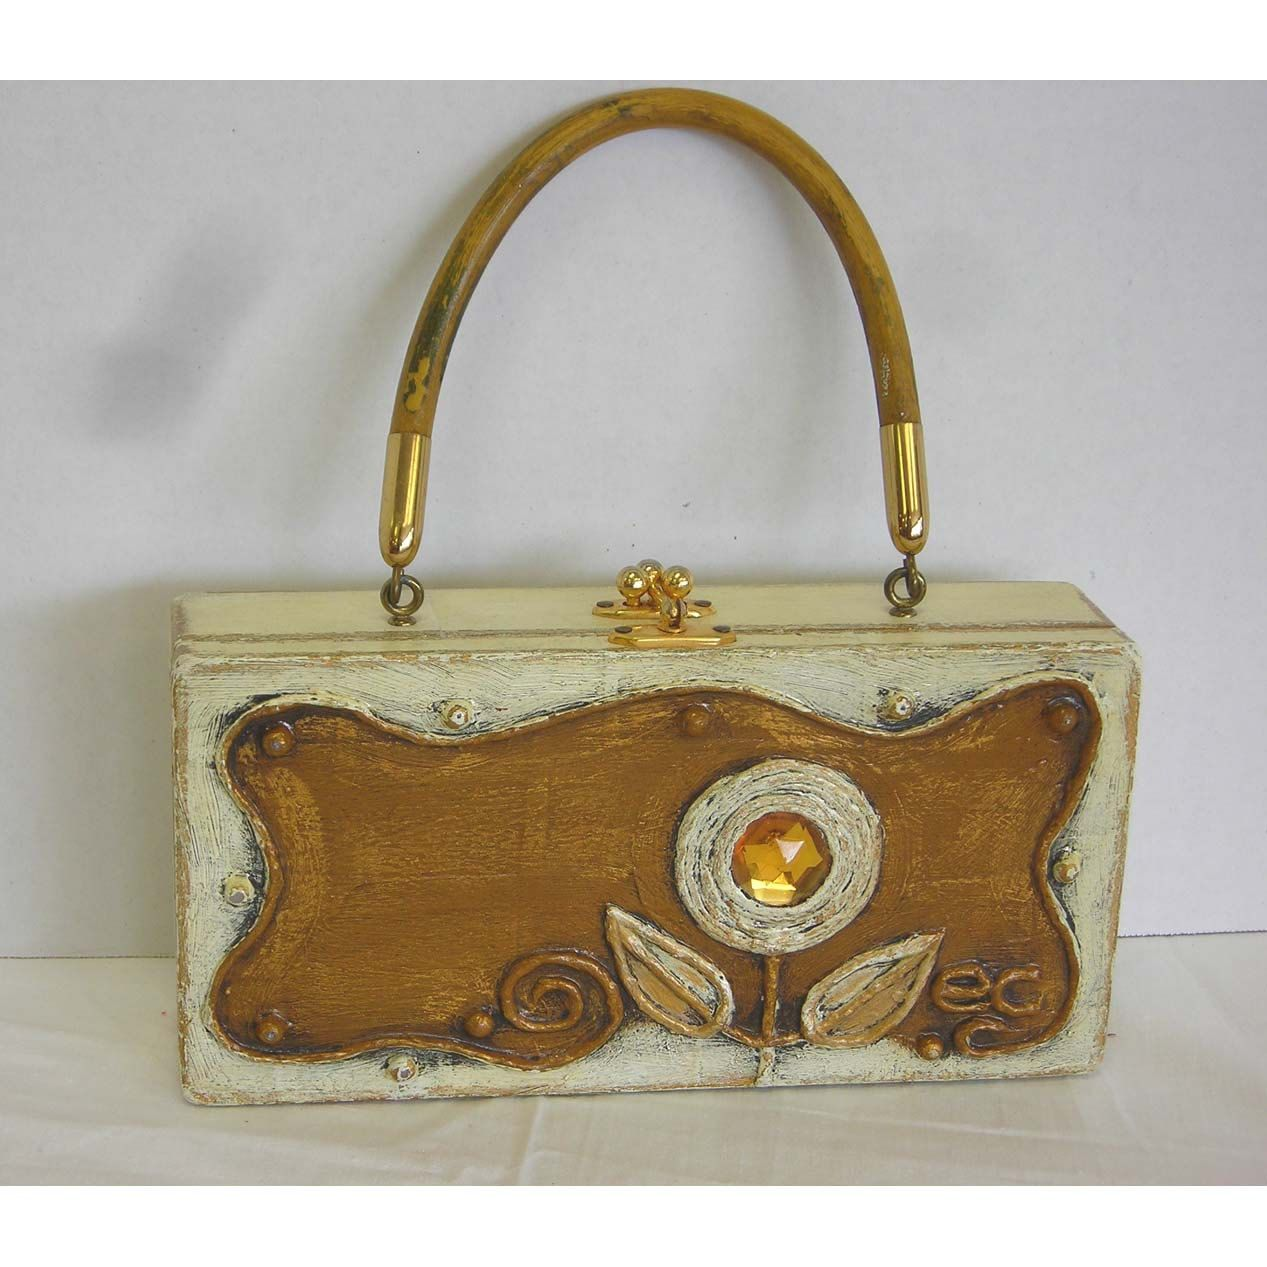 1960s Enid Collins HTF Rare Paper Mache Box Purse Floral Handbag Vintage - pinned by pin4etsy.com